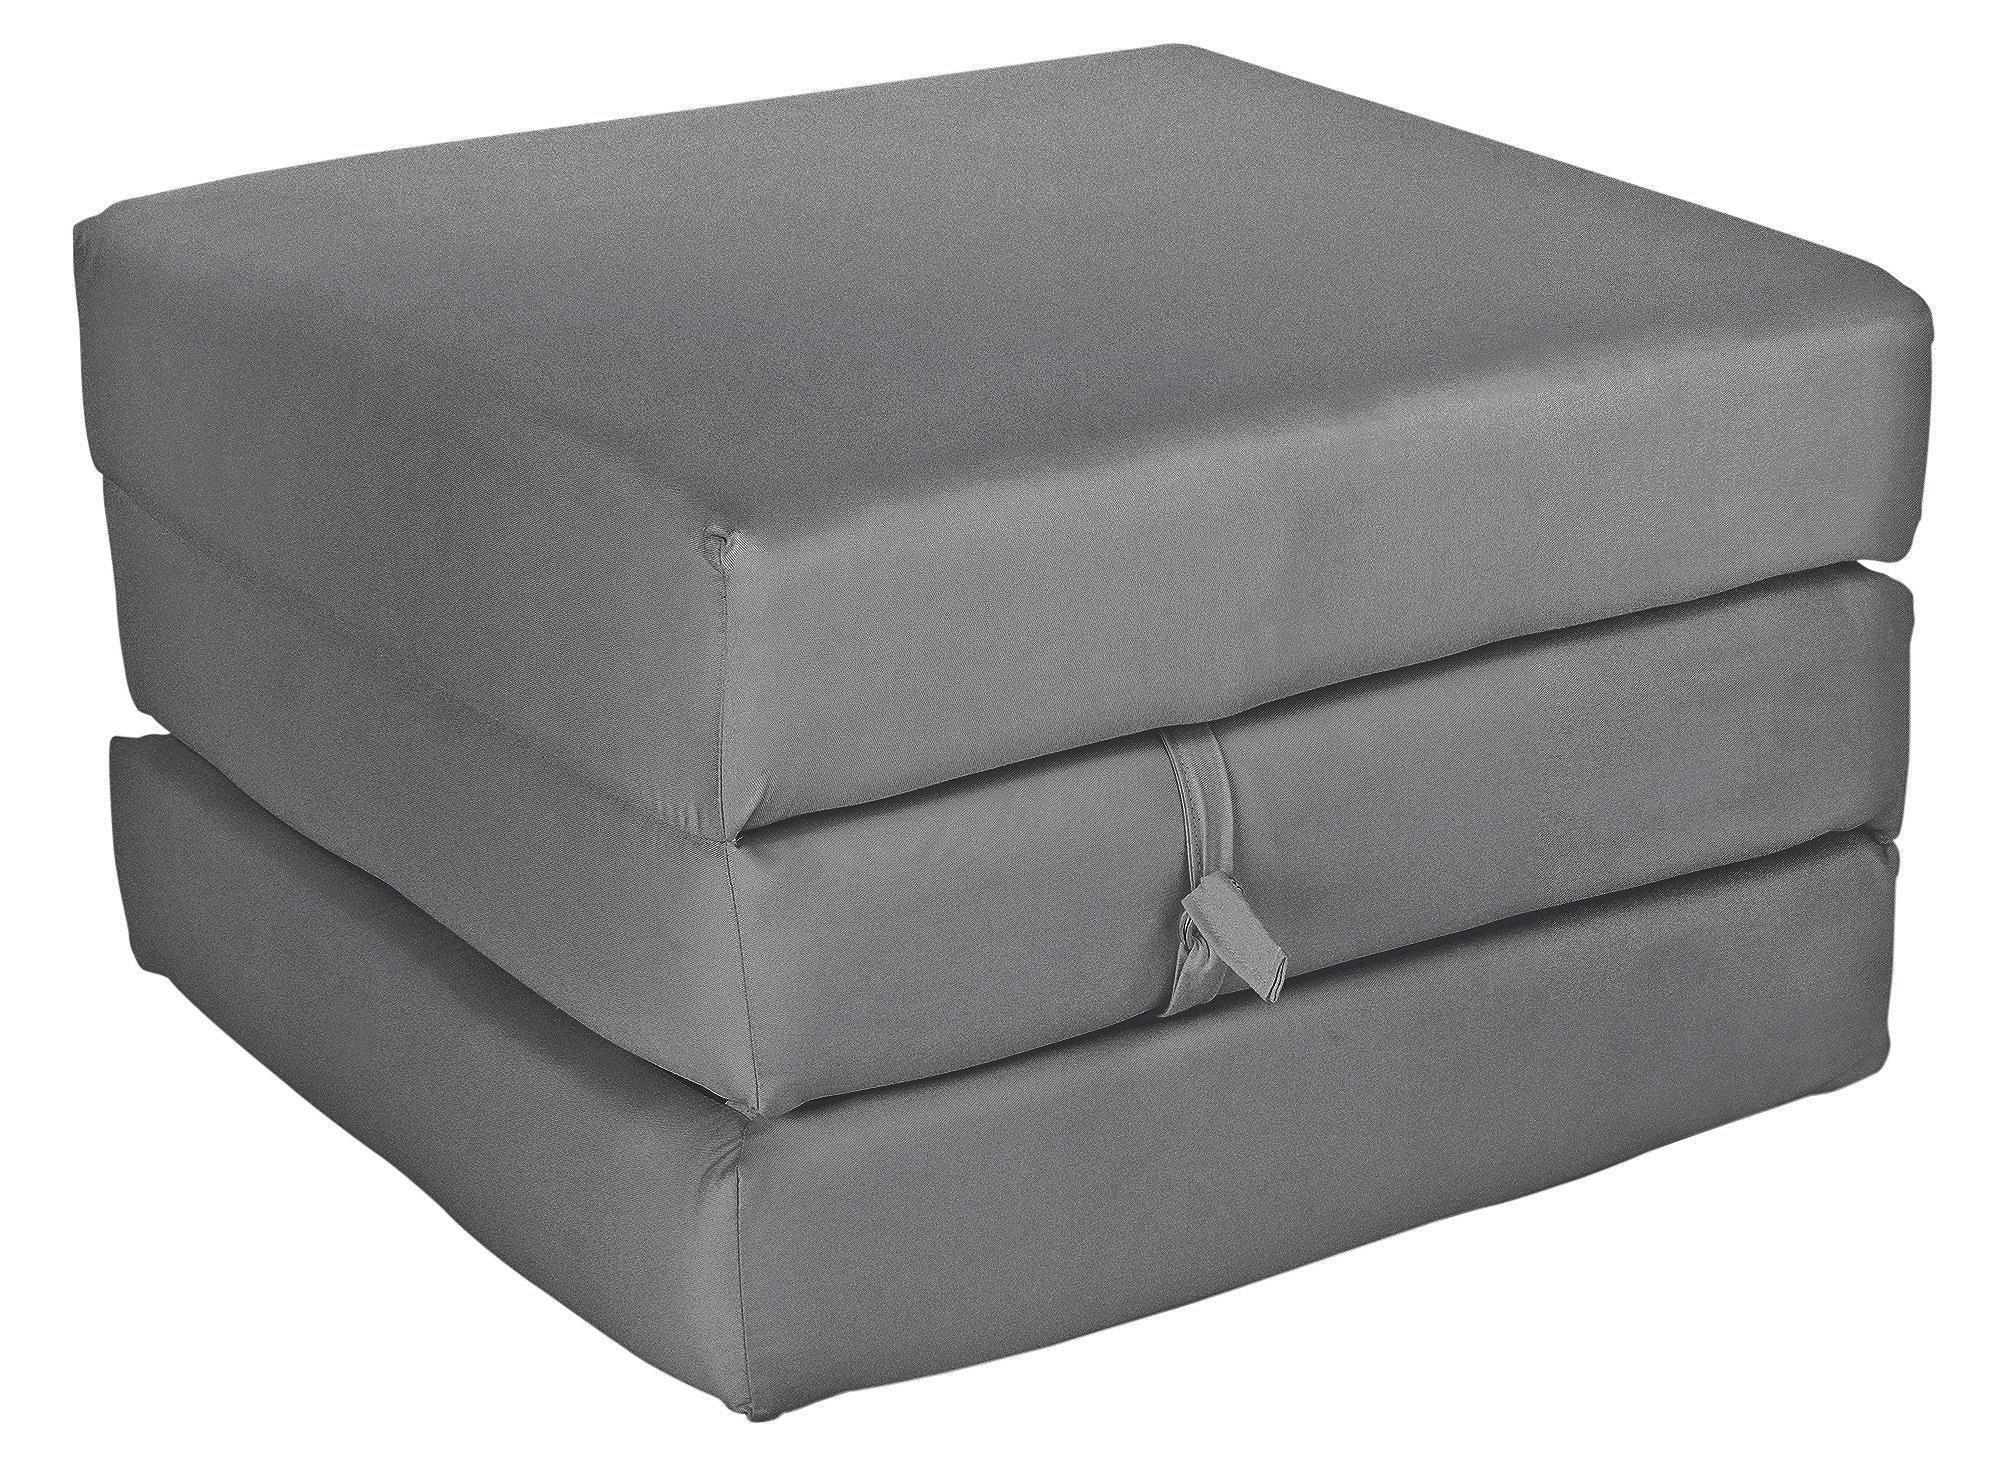 Habitat Single Mattress Cube - Flint Grey